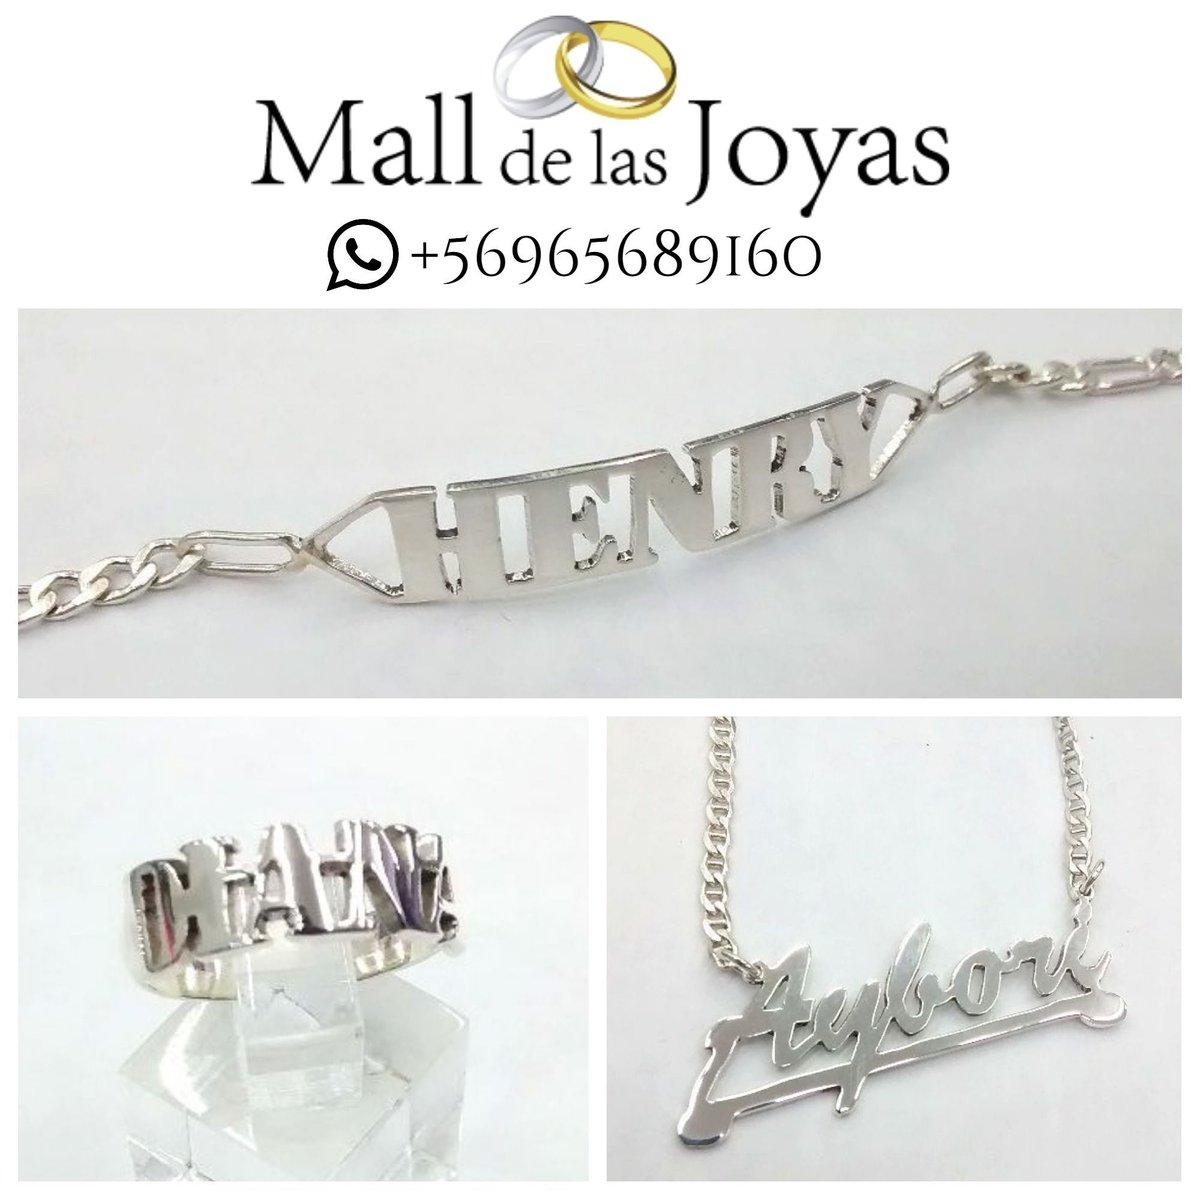 14b0c69b4163 Mall de las Joyas on Twitter